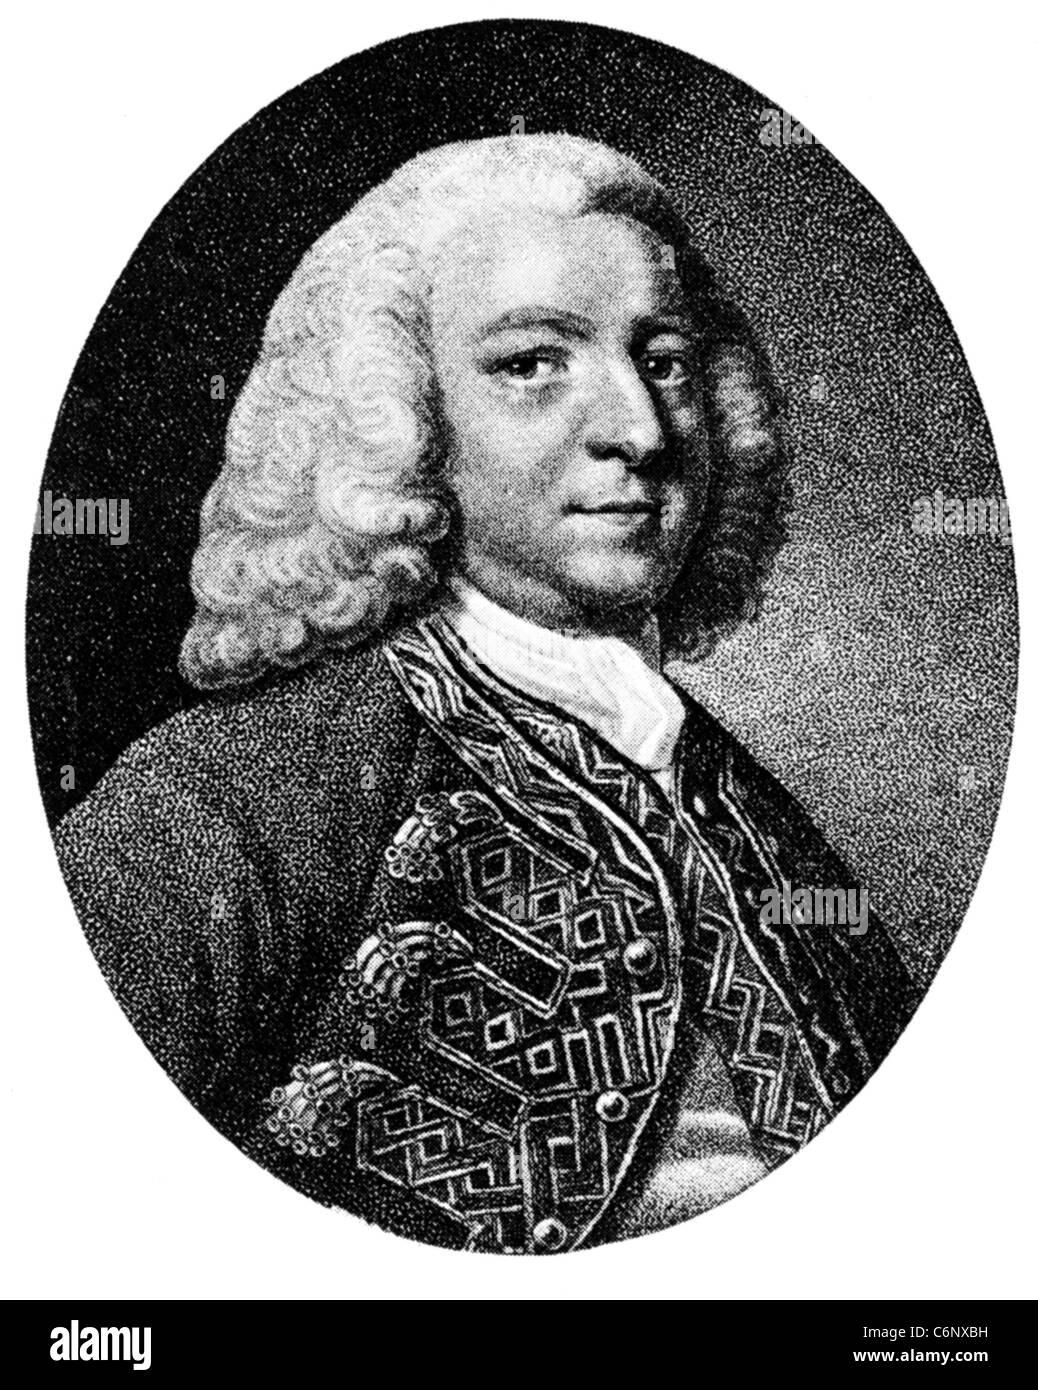 GEORGE ANSON (1697-1762) British admiral who circumnavigated the globe - Stock Image